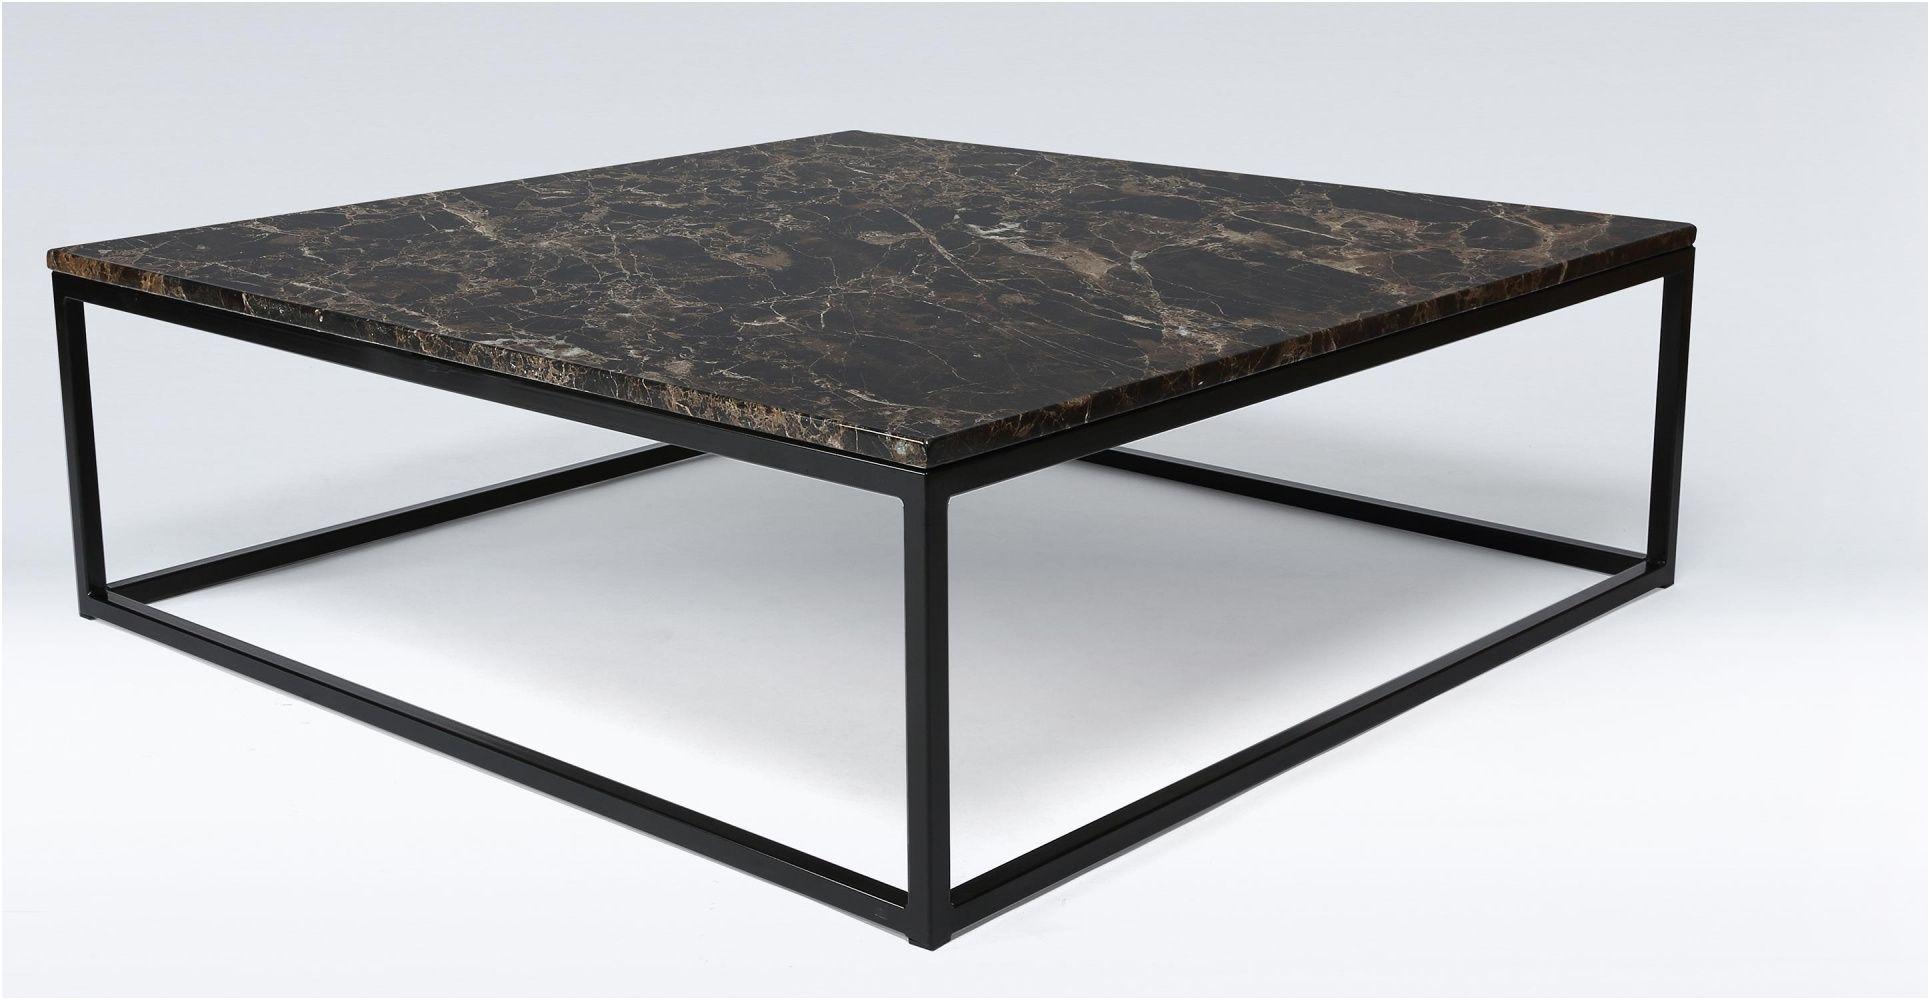 9 Precieux Table Basse Marbre But Pictures